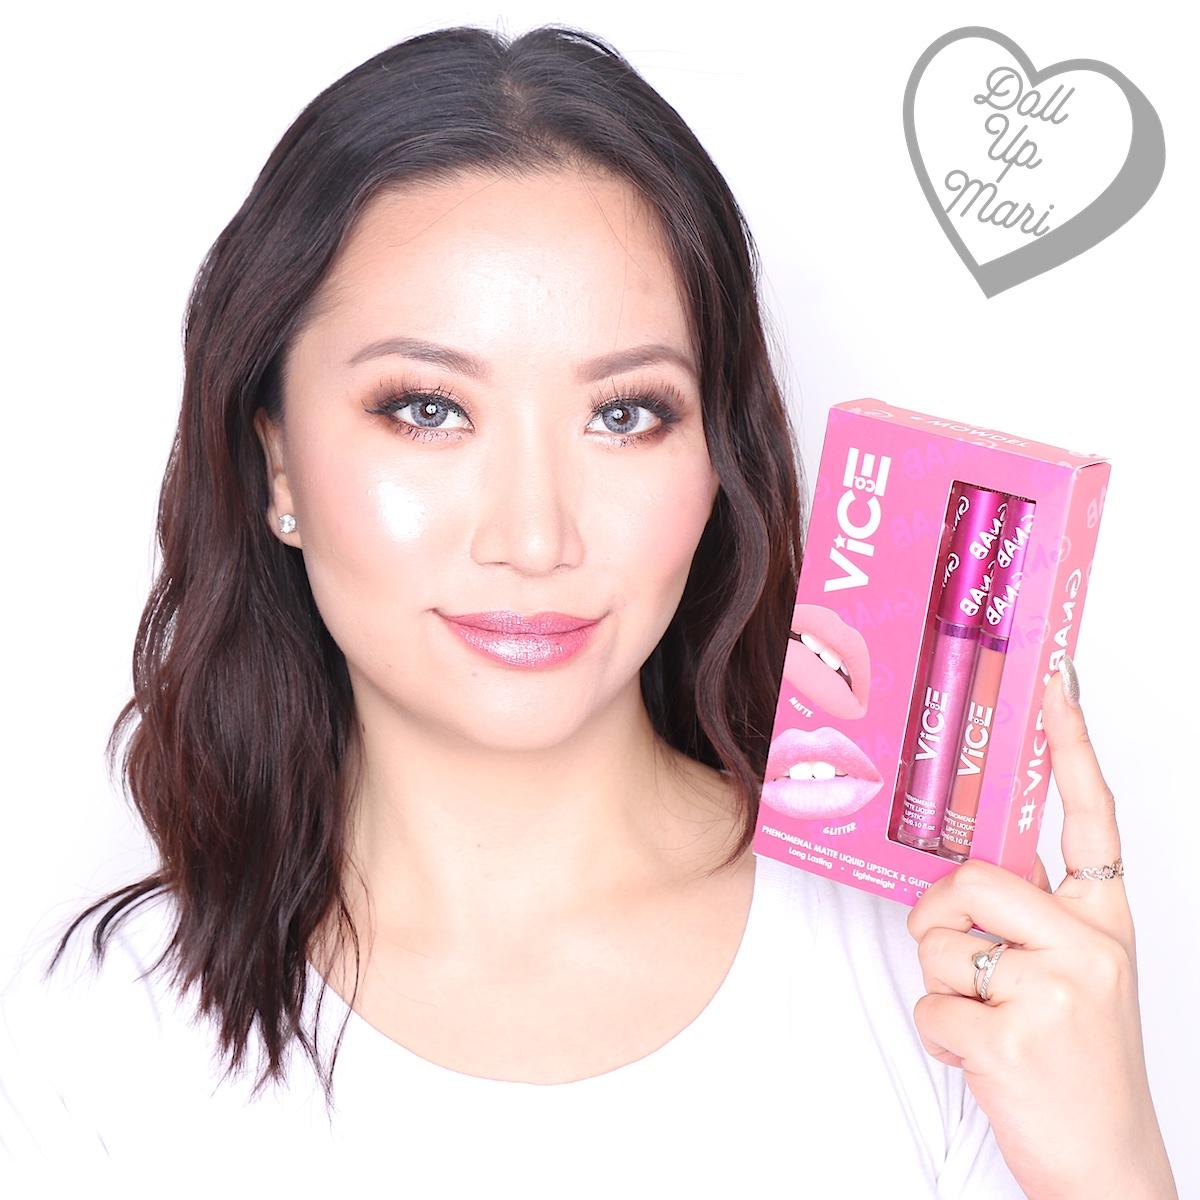 Mari wearing both matte liquid lipstick and glitter topper of the Mowdel set of Vice X Bang lip set collection